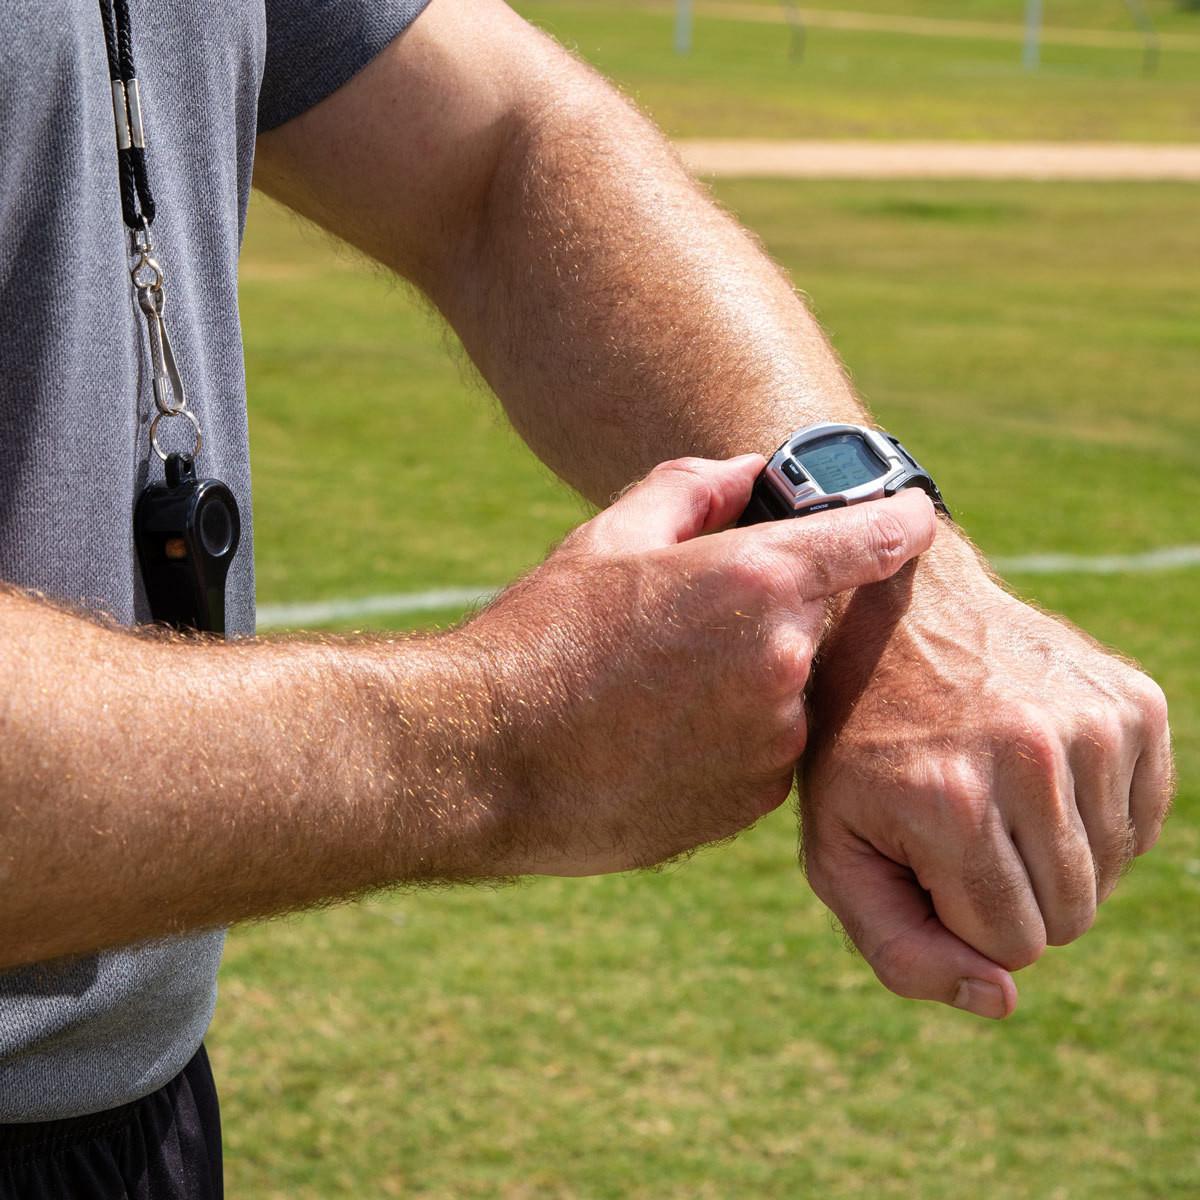 Champion Sports Soccer Referee Watch (MS1000)